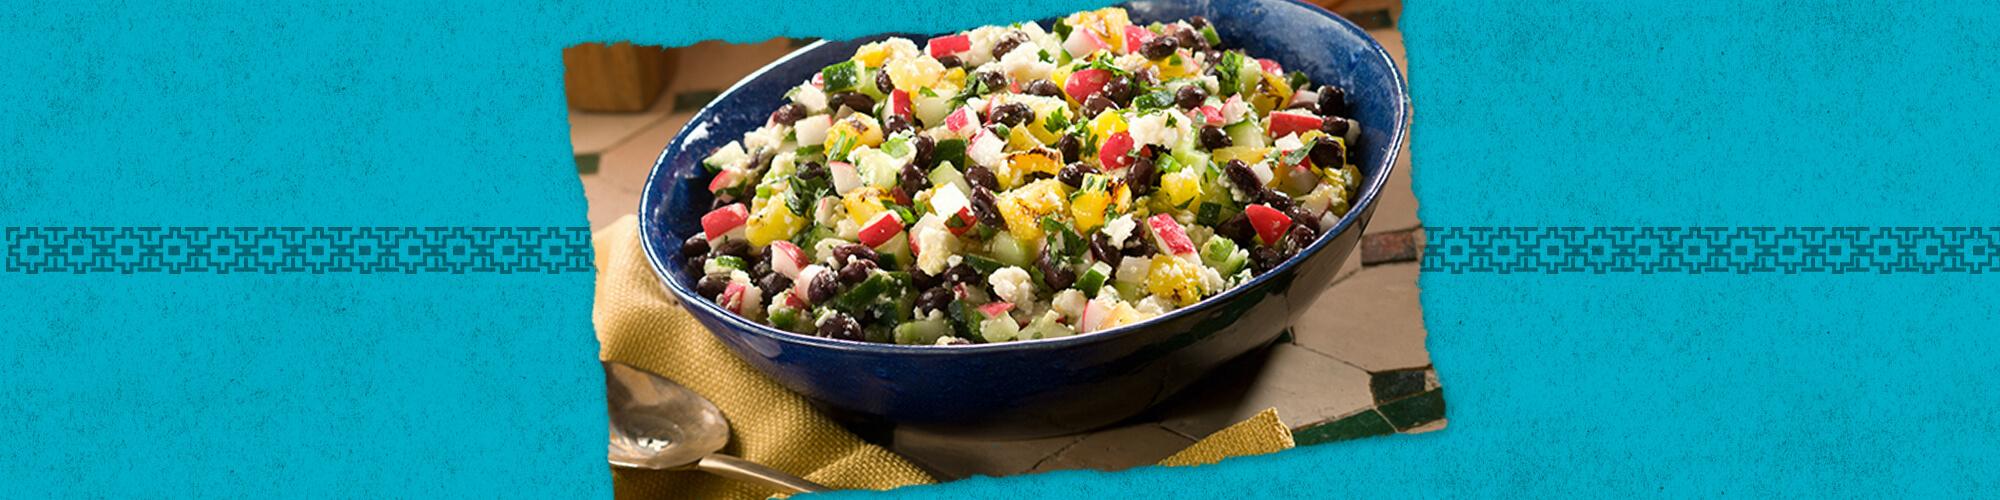 Salsas black bean grilled pineapple cucumber salad